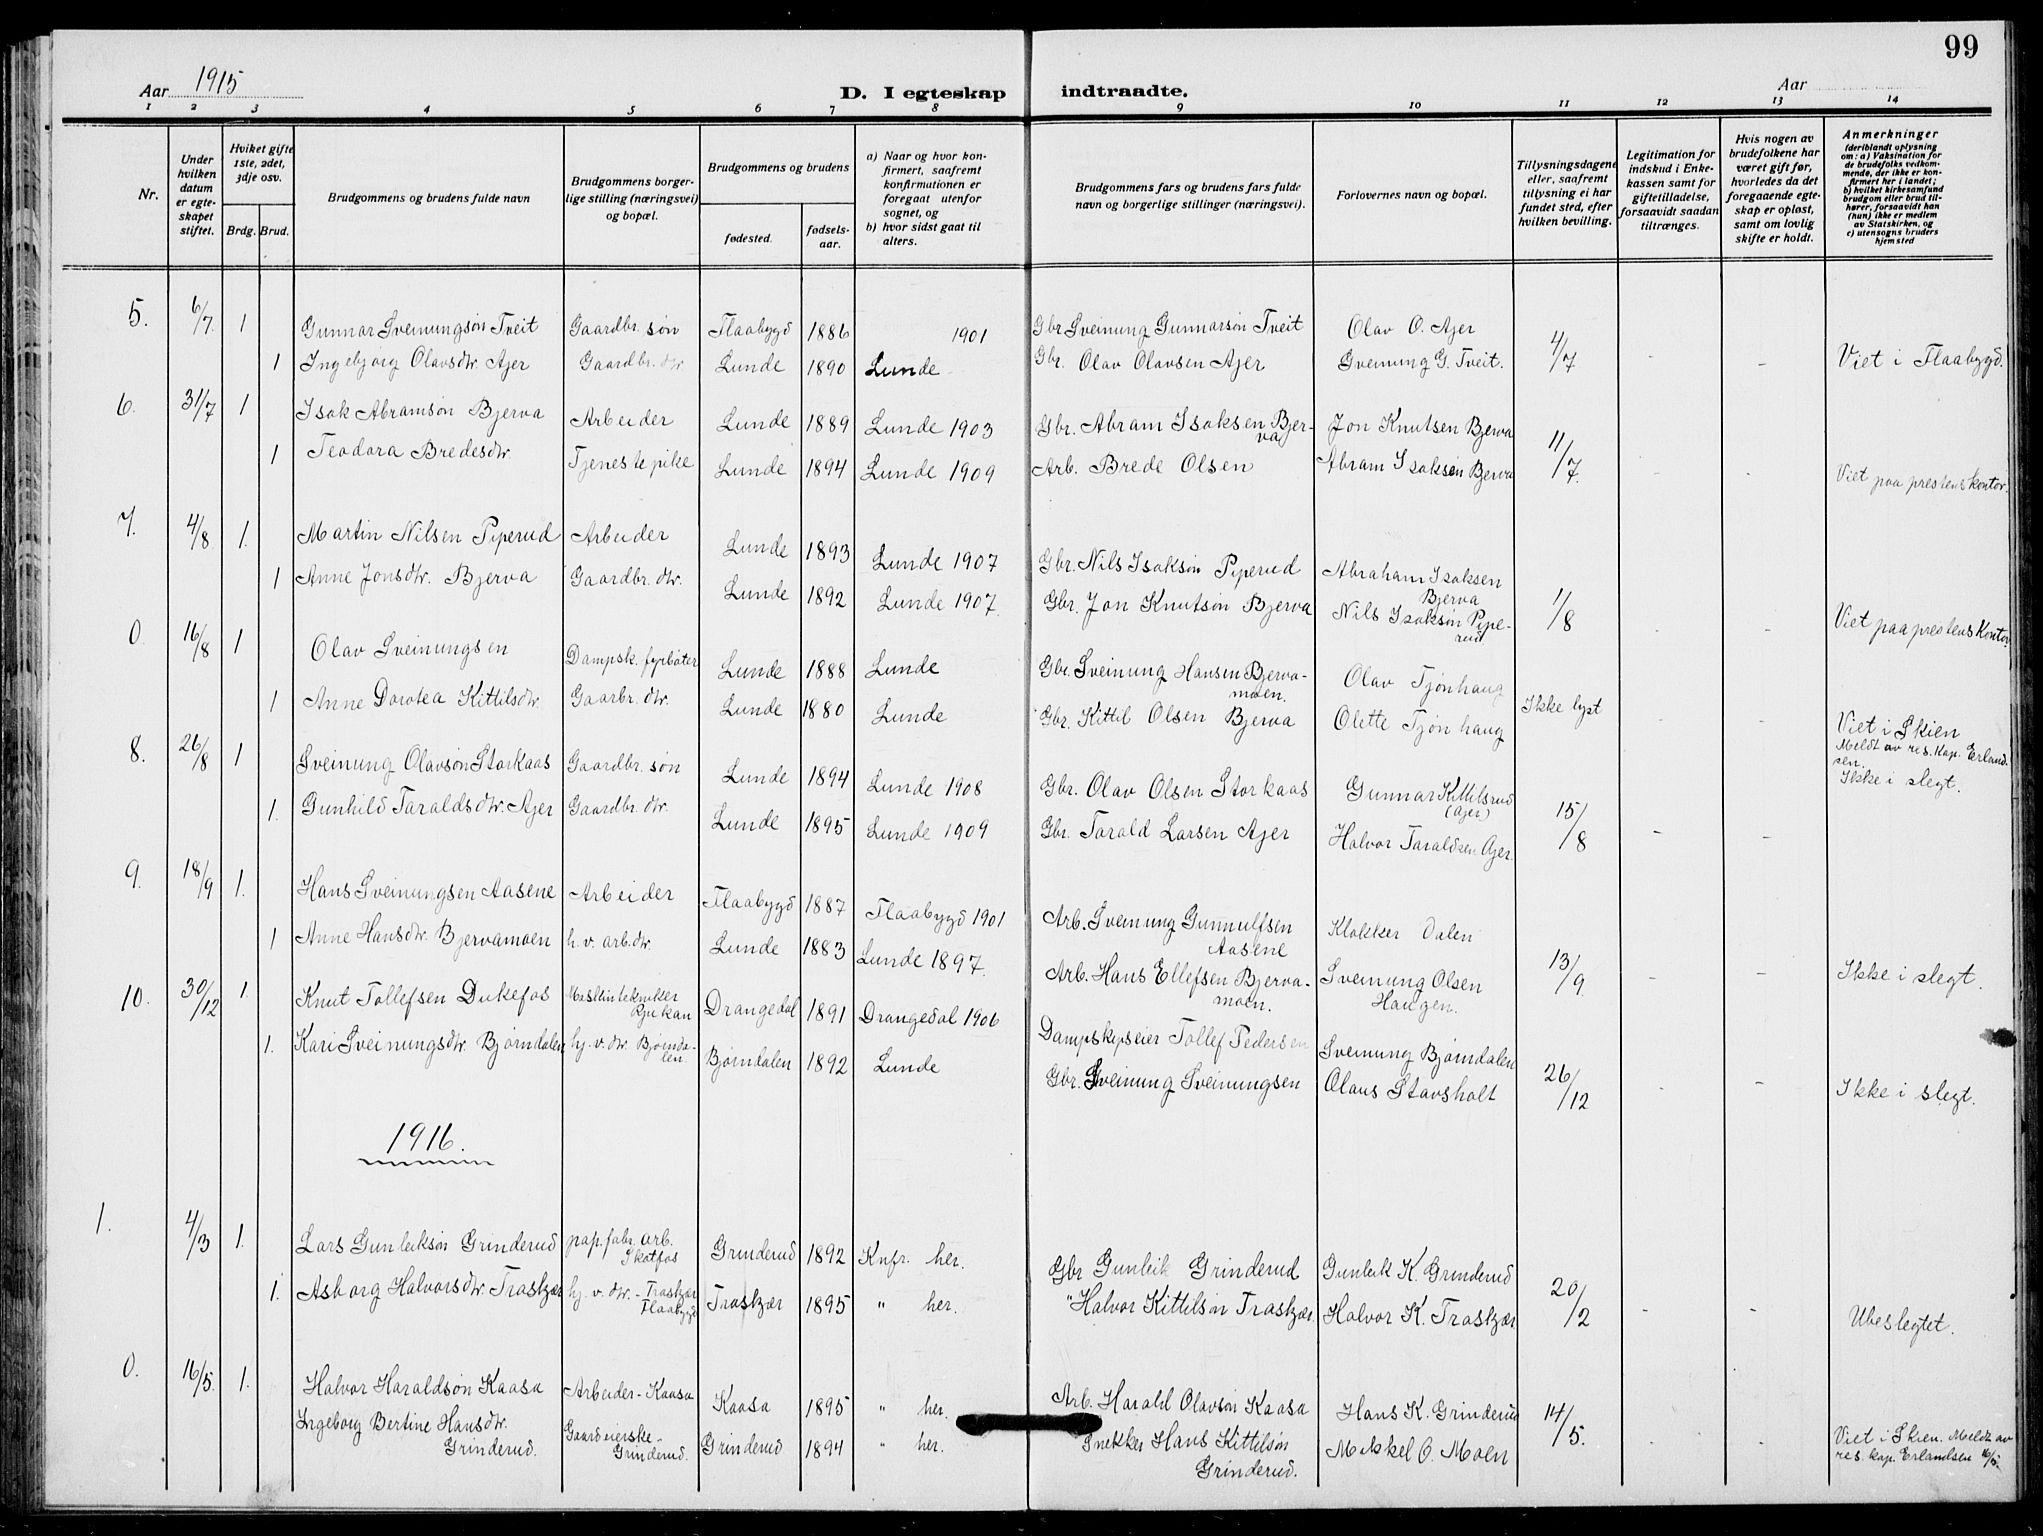 SAKO, Lunde kirkebøker, F/Fa/L0005: Ministerialbok nr. I 5, 1914-1922, s. 99